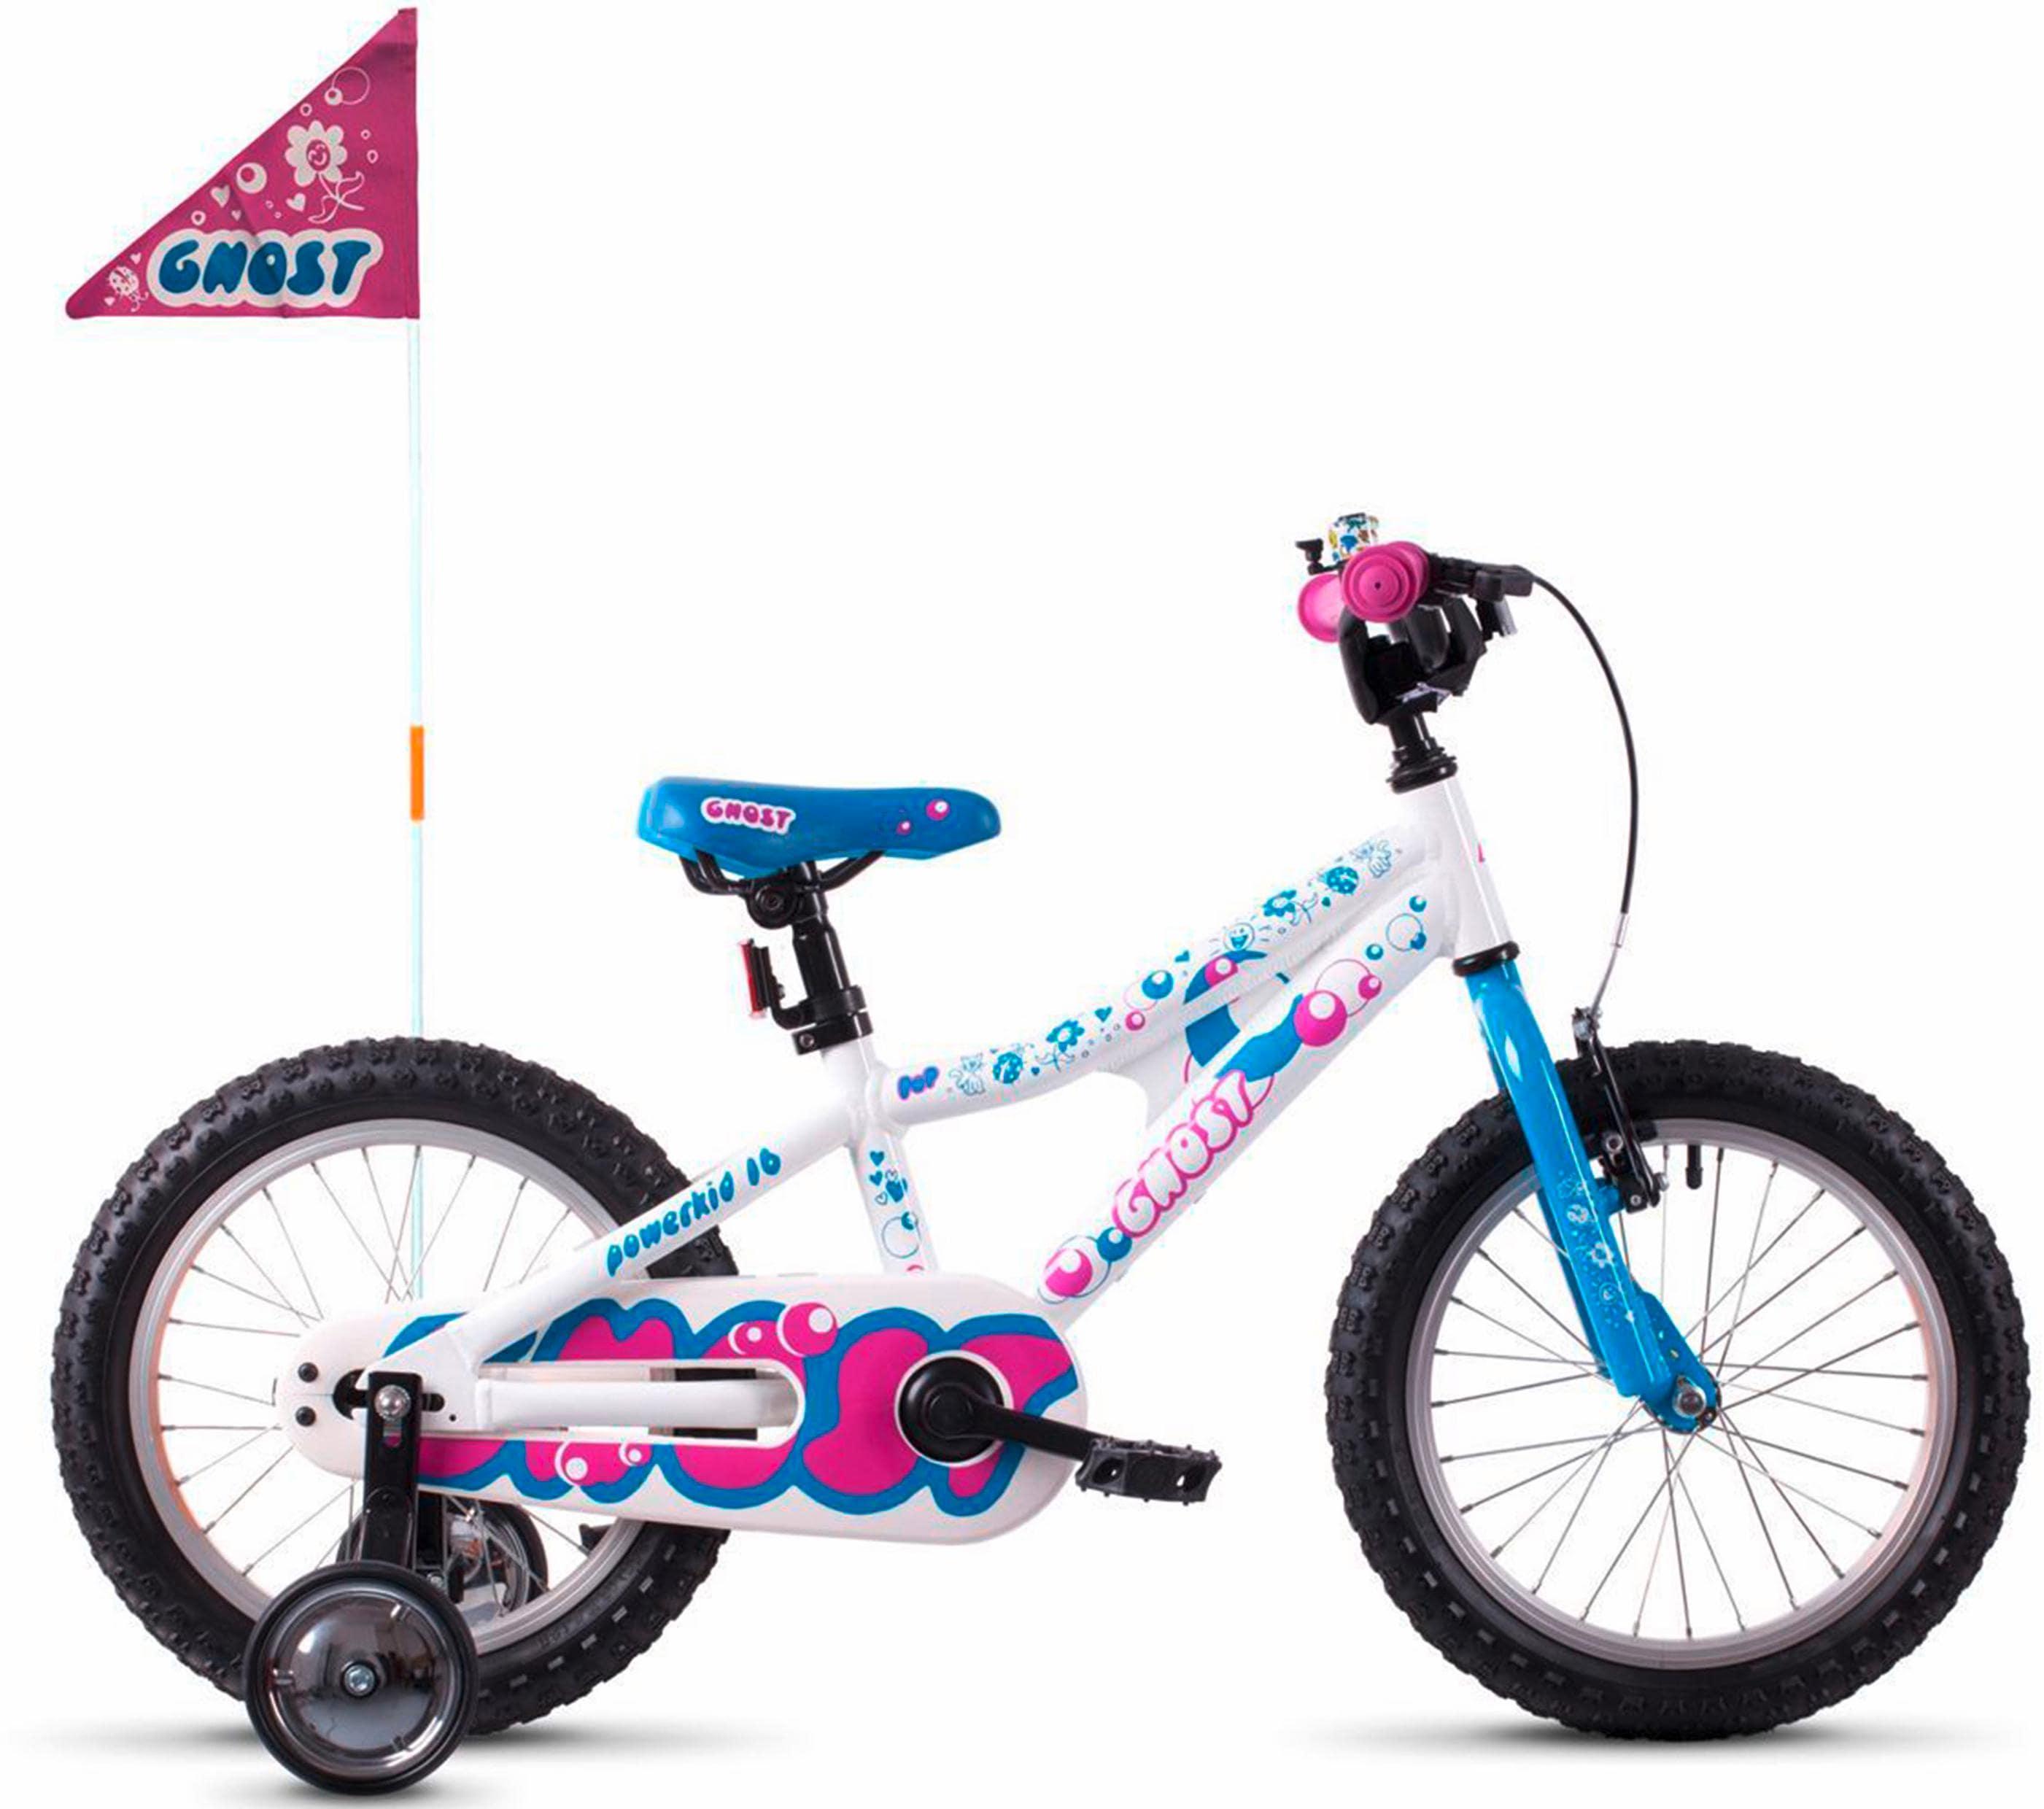 Ghost Kinderfahrrad POWERKID AL 16 K weiß Kinder Kinderfahrräder Fahrräder Zubehör Fahrrad